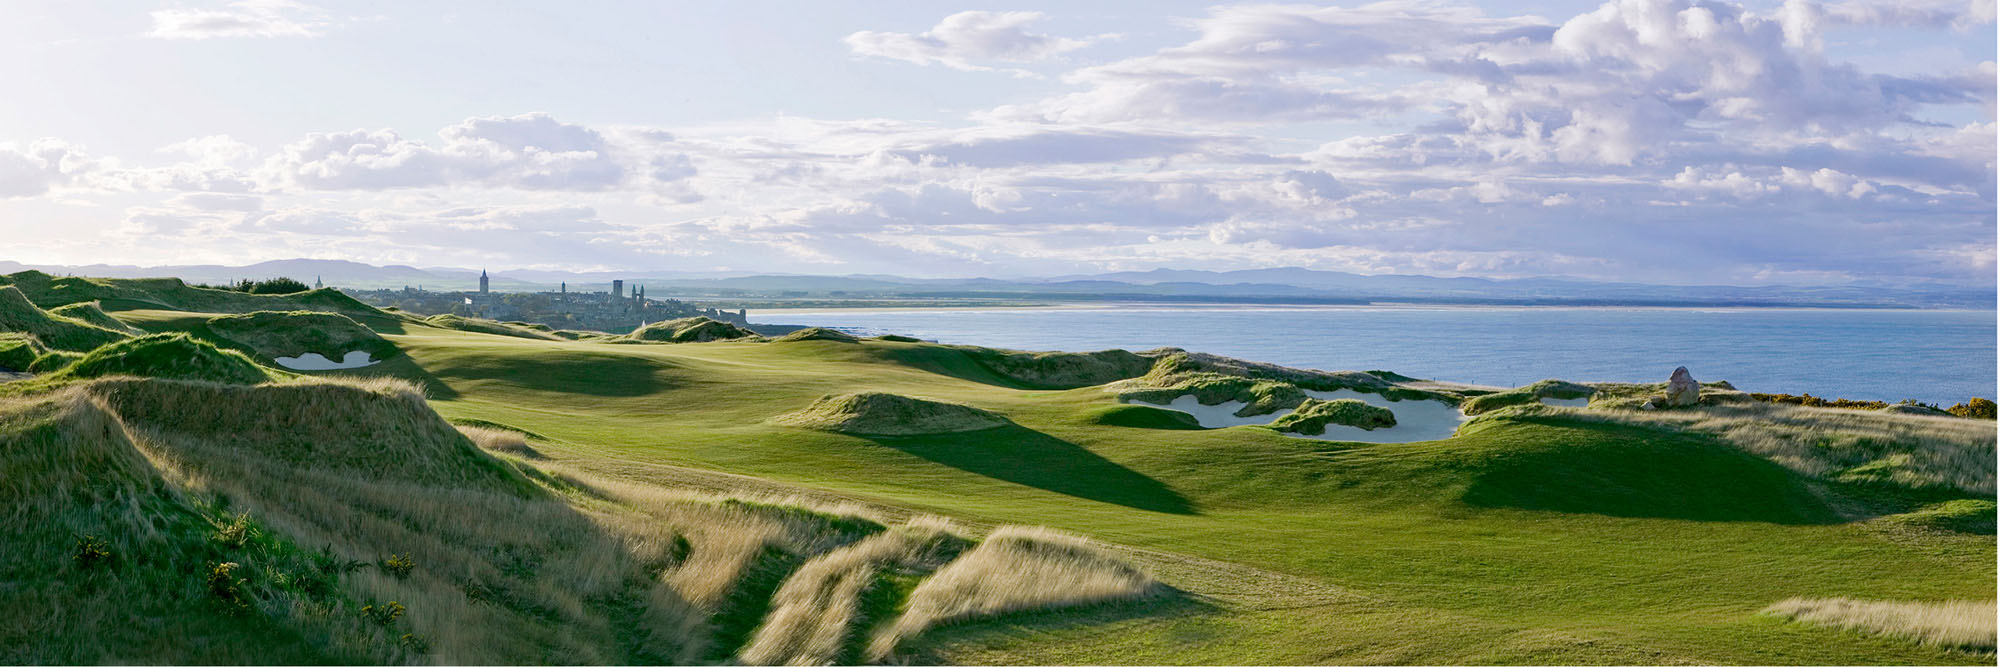 Golf Course Image - St Andrews Castle No. 3